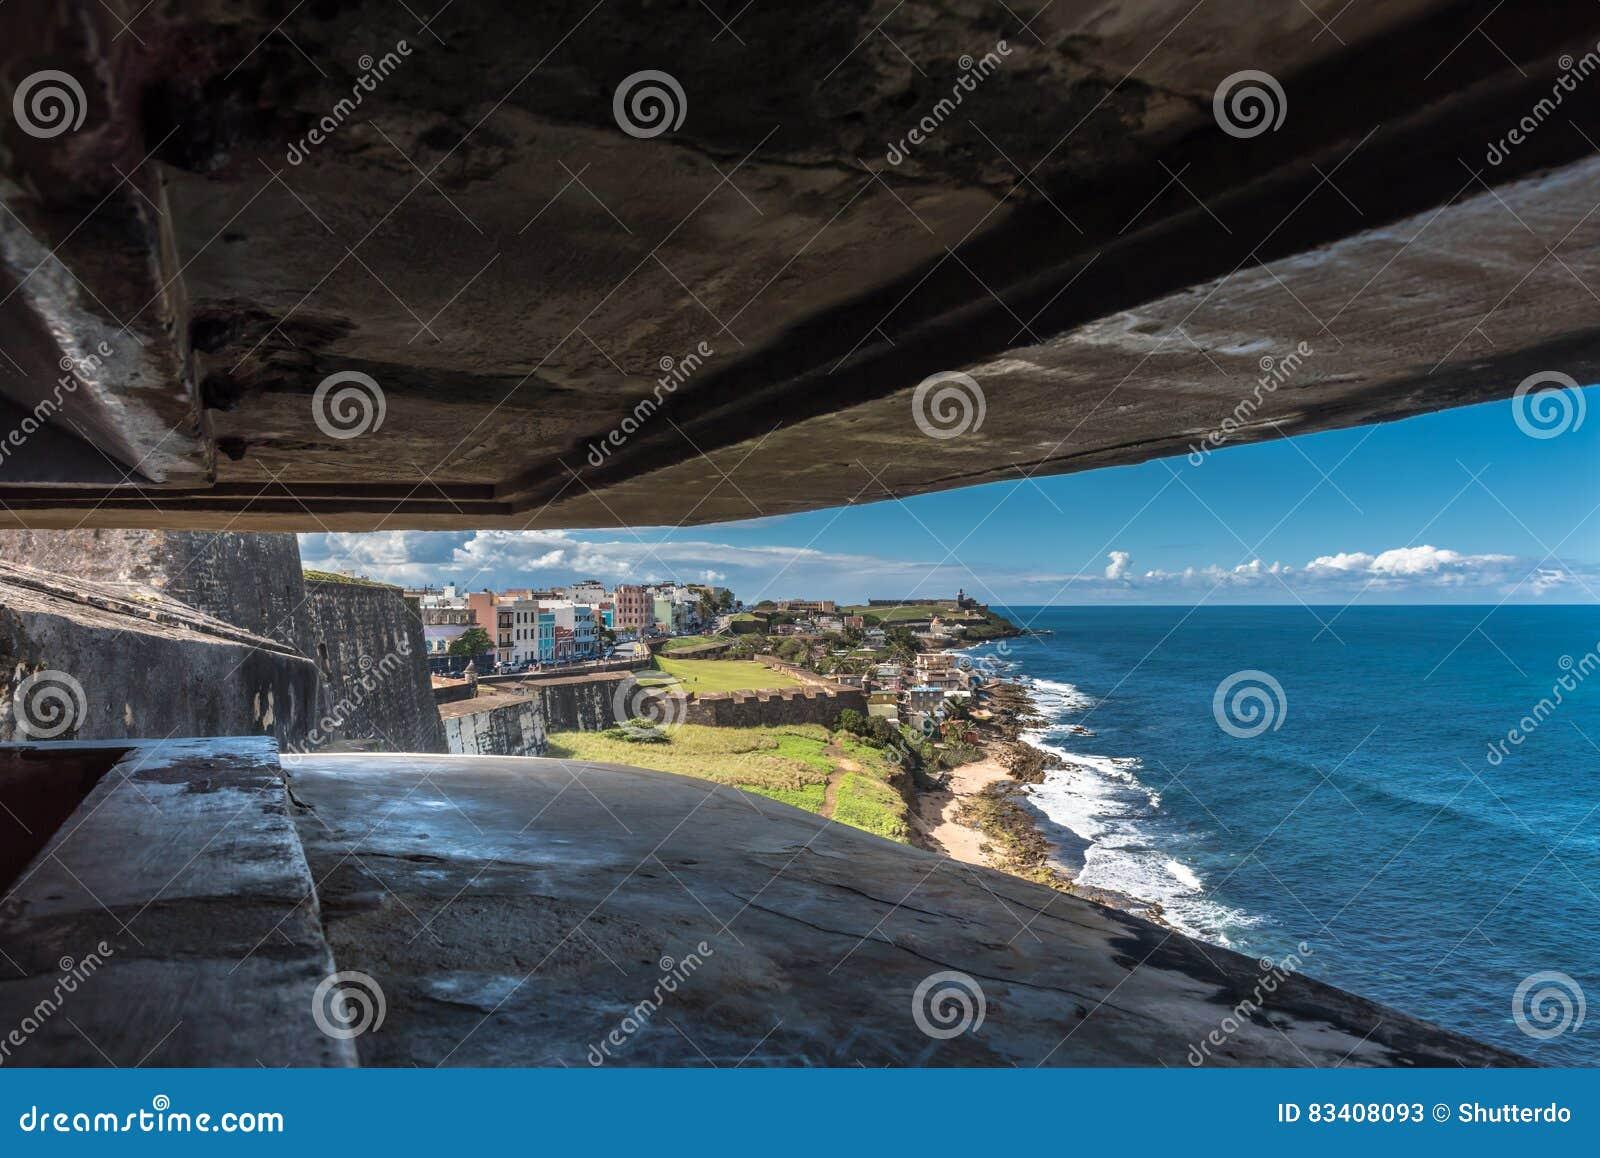 View from a bunker within Castillo de San Cristobal